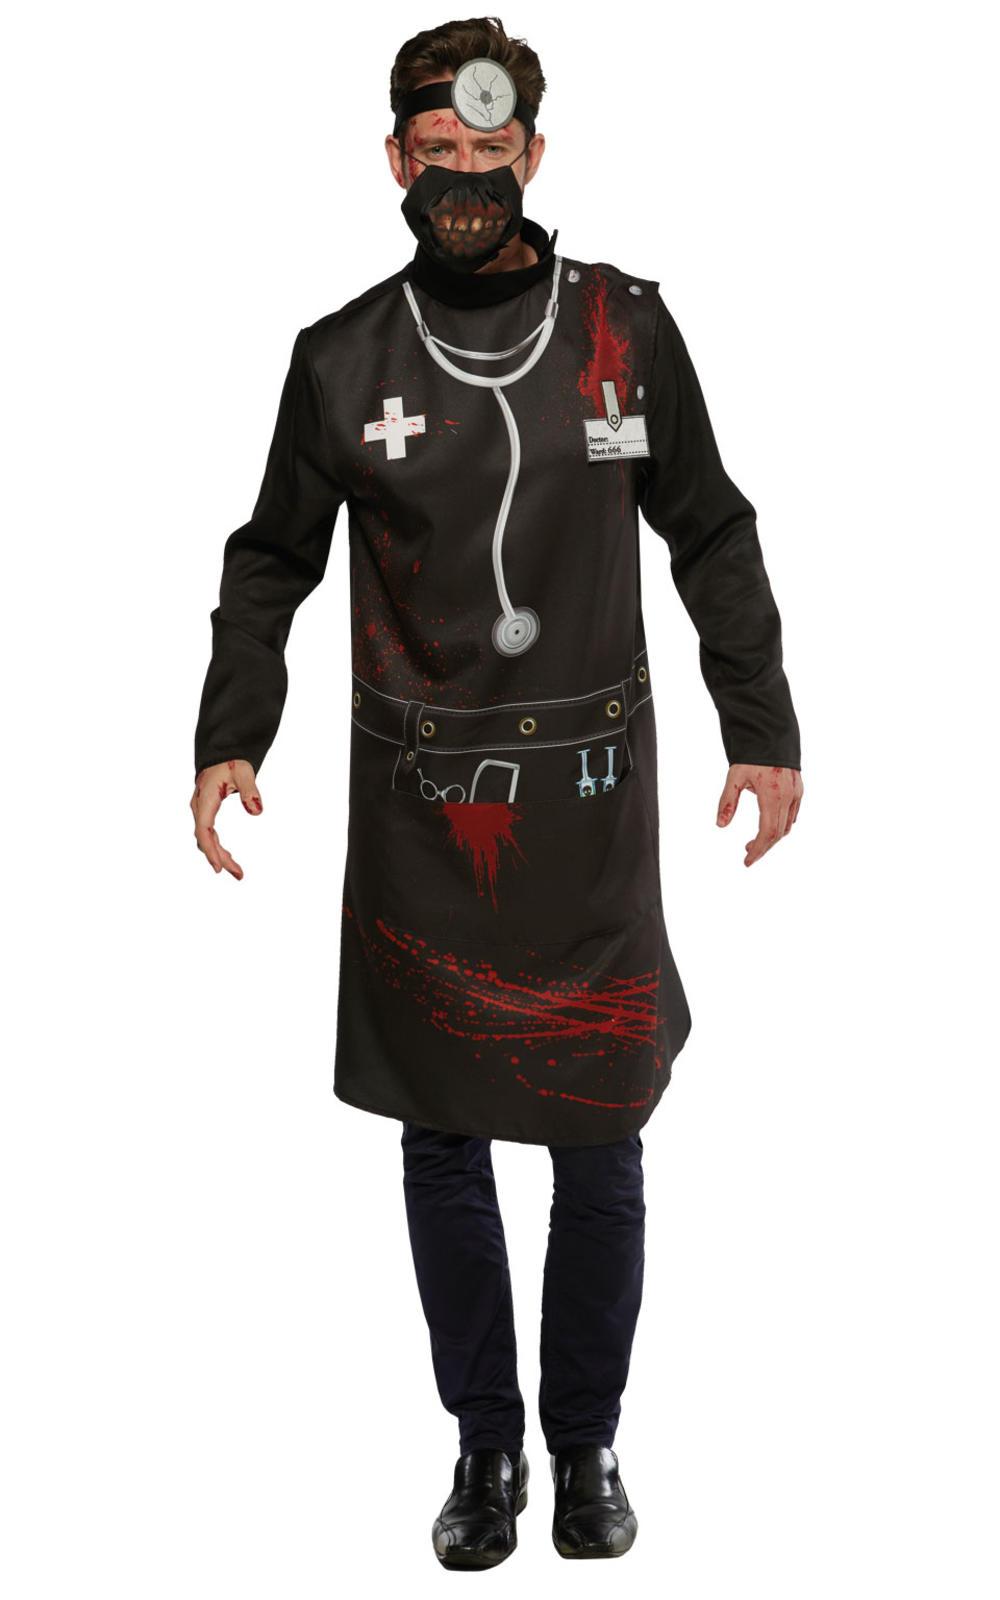 Horror Doctor Mens Halloween Fancy Dress Scary Gory Zombie Uniform Adult Costume